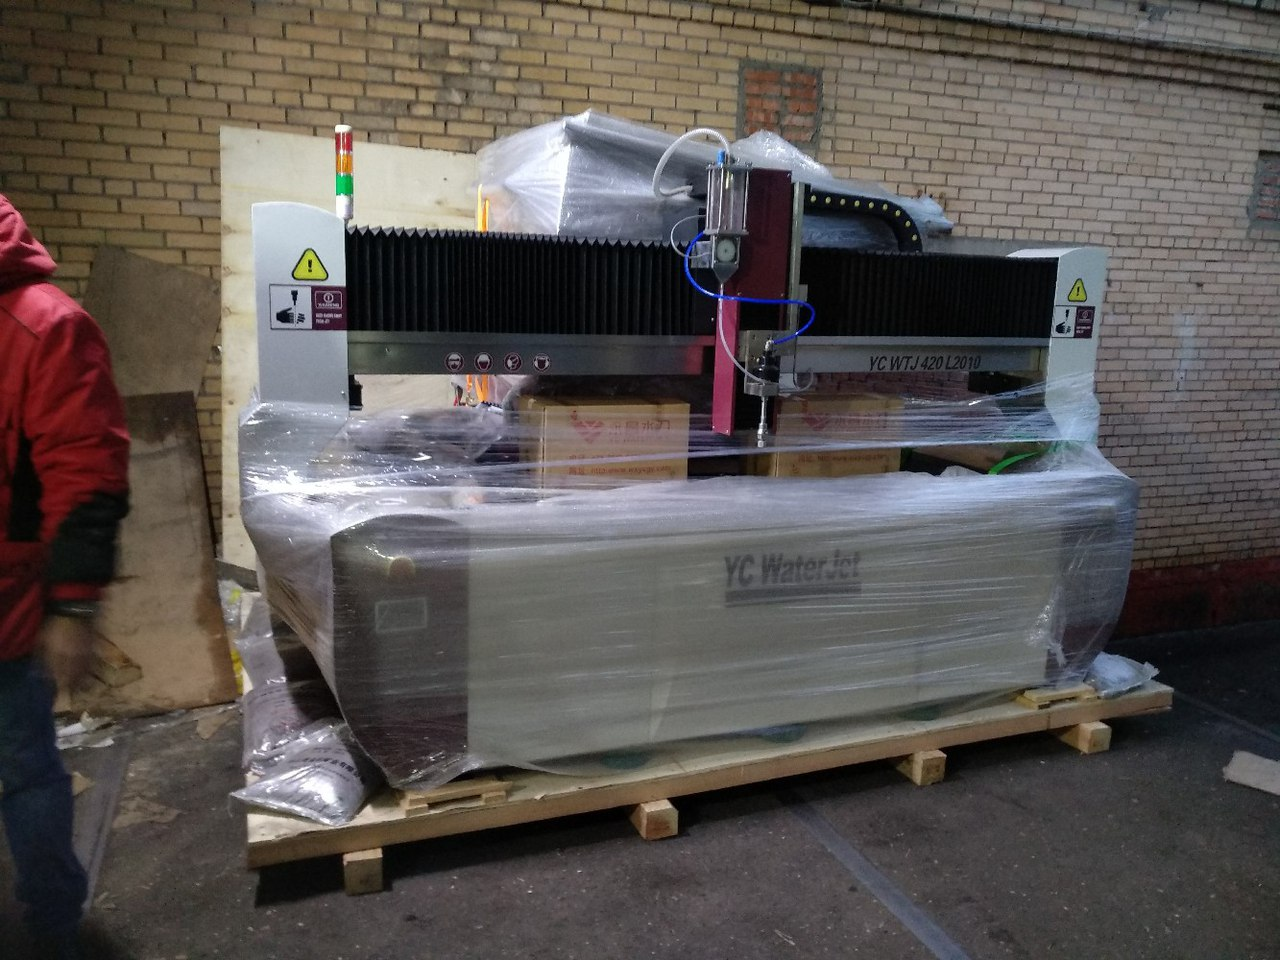 1ZUXeIxxAwc - Гидроабразивный станок с ЧПУ YC Waterjet